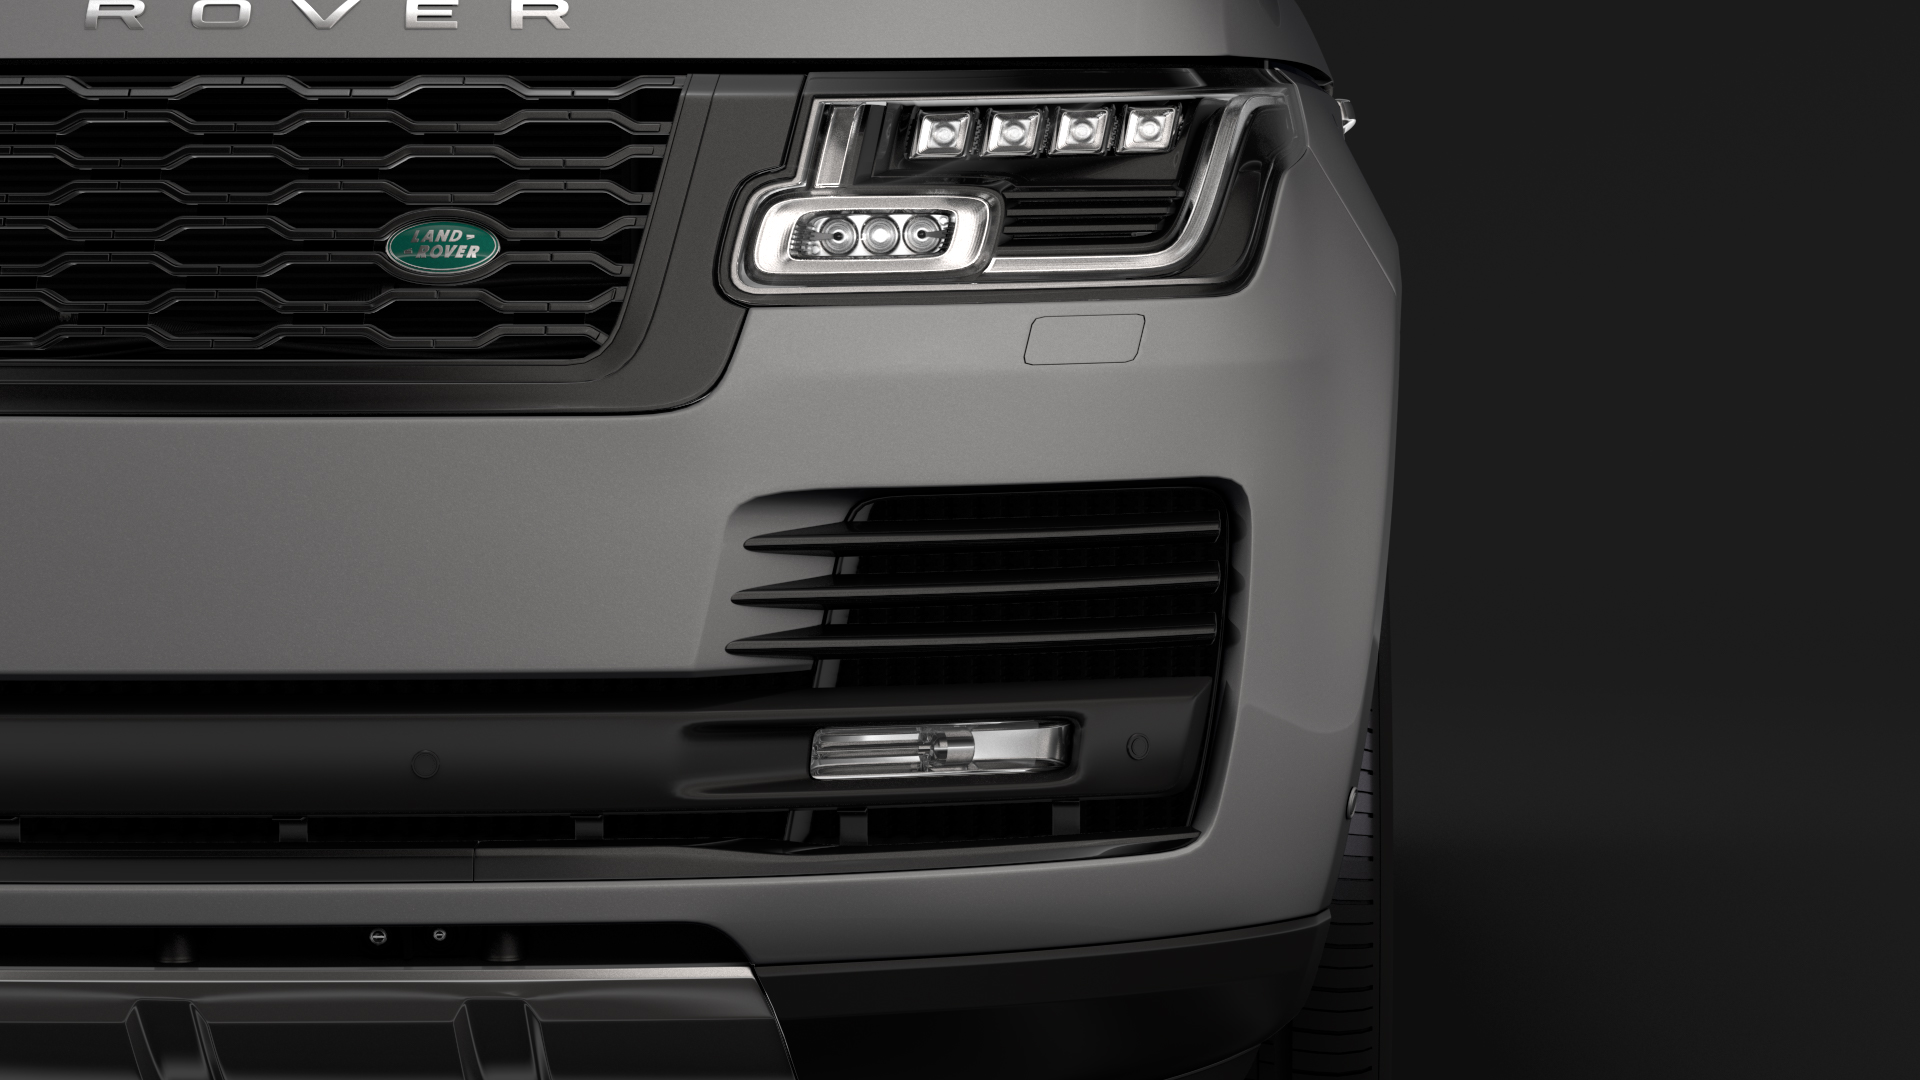 range rover vogue lwb l405 2018 3d model max fbx c4d lwo ma mb hrc xsi obj 277514